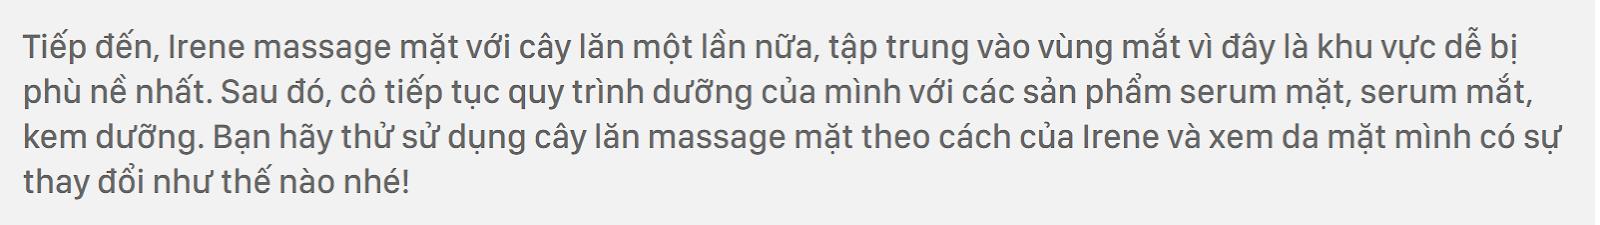 Cách đắp mặt nạ giấy của Irene Kim